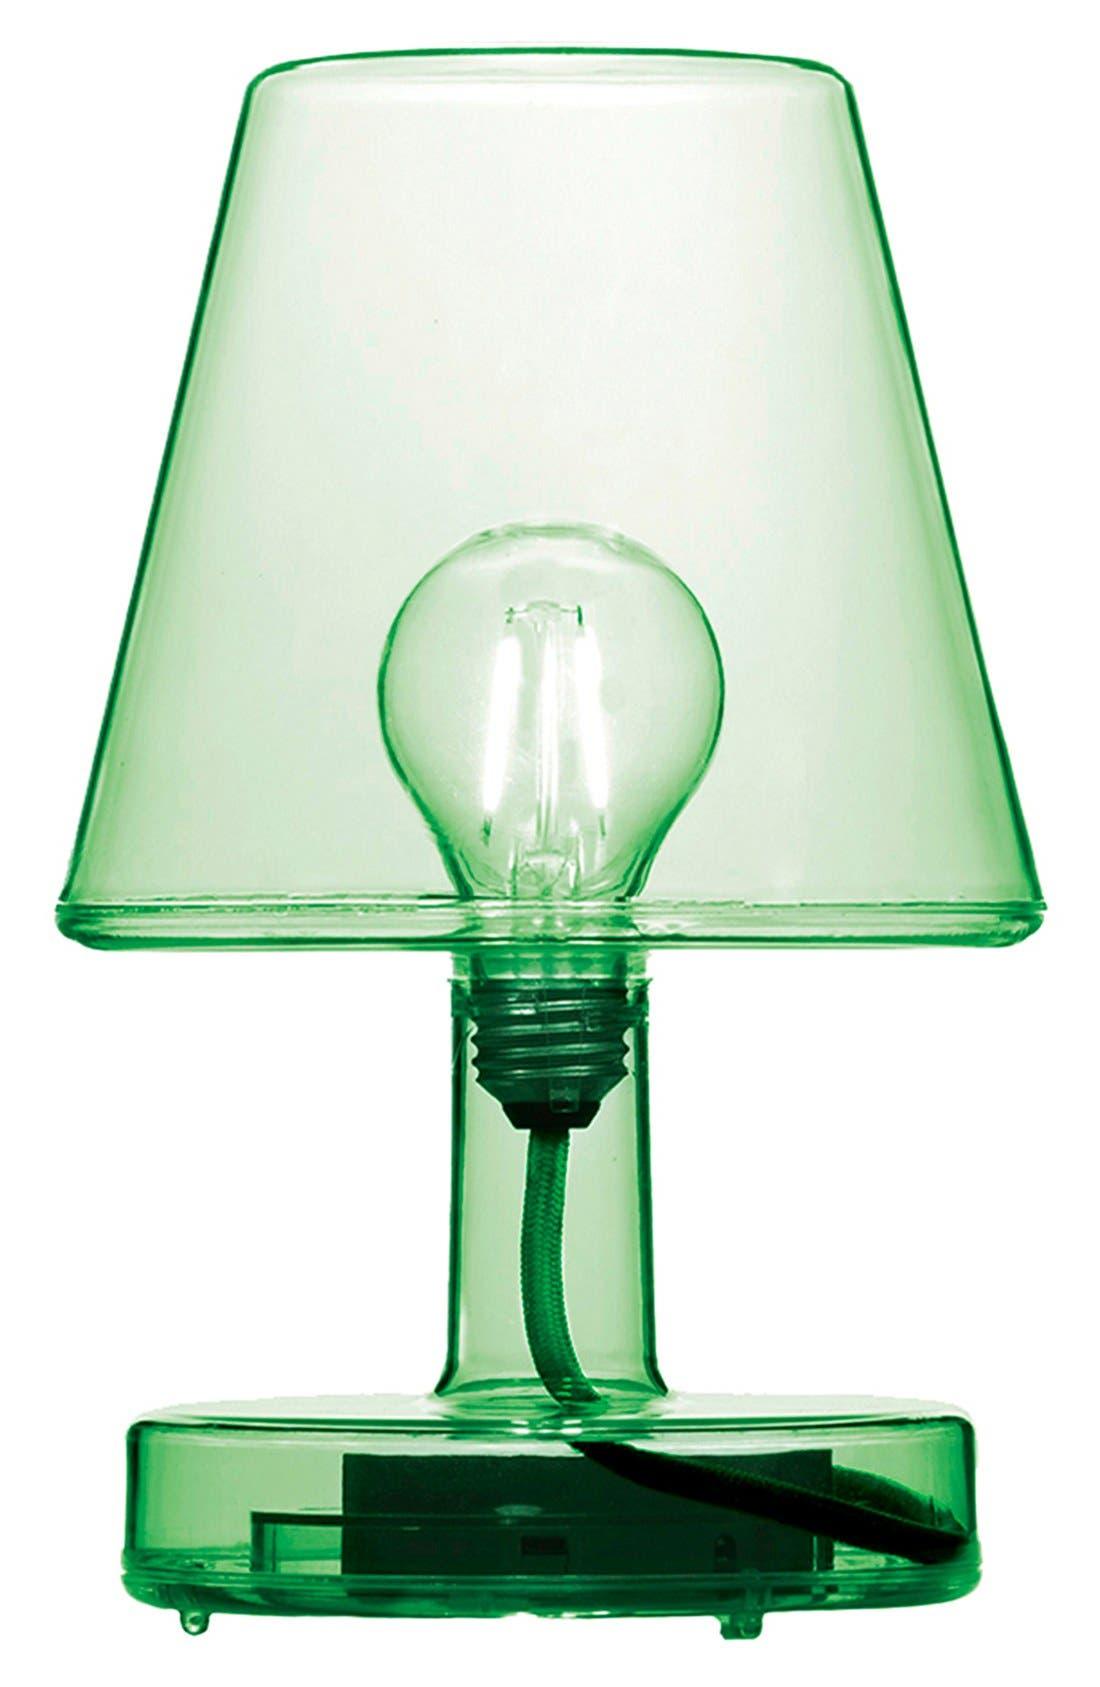 Fatboy 'Edison the Petit' Lamp